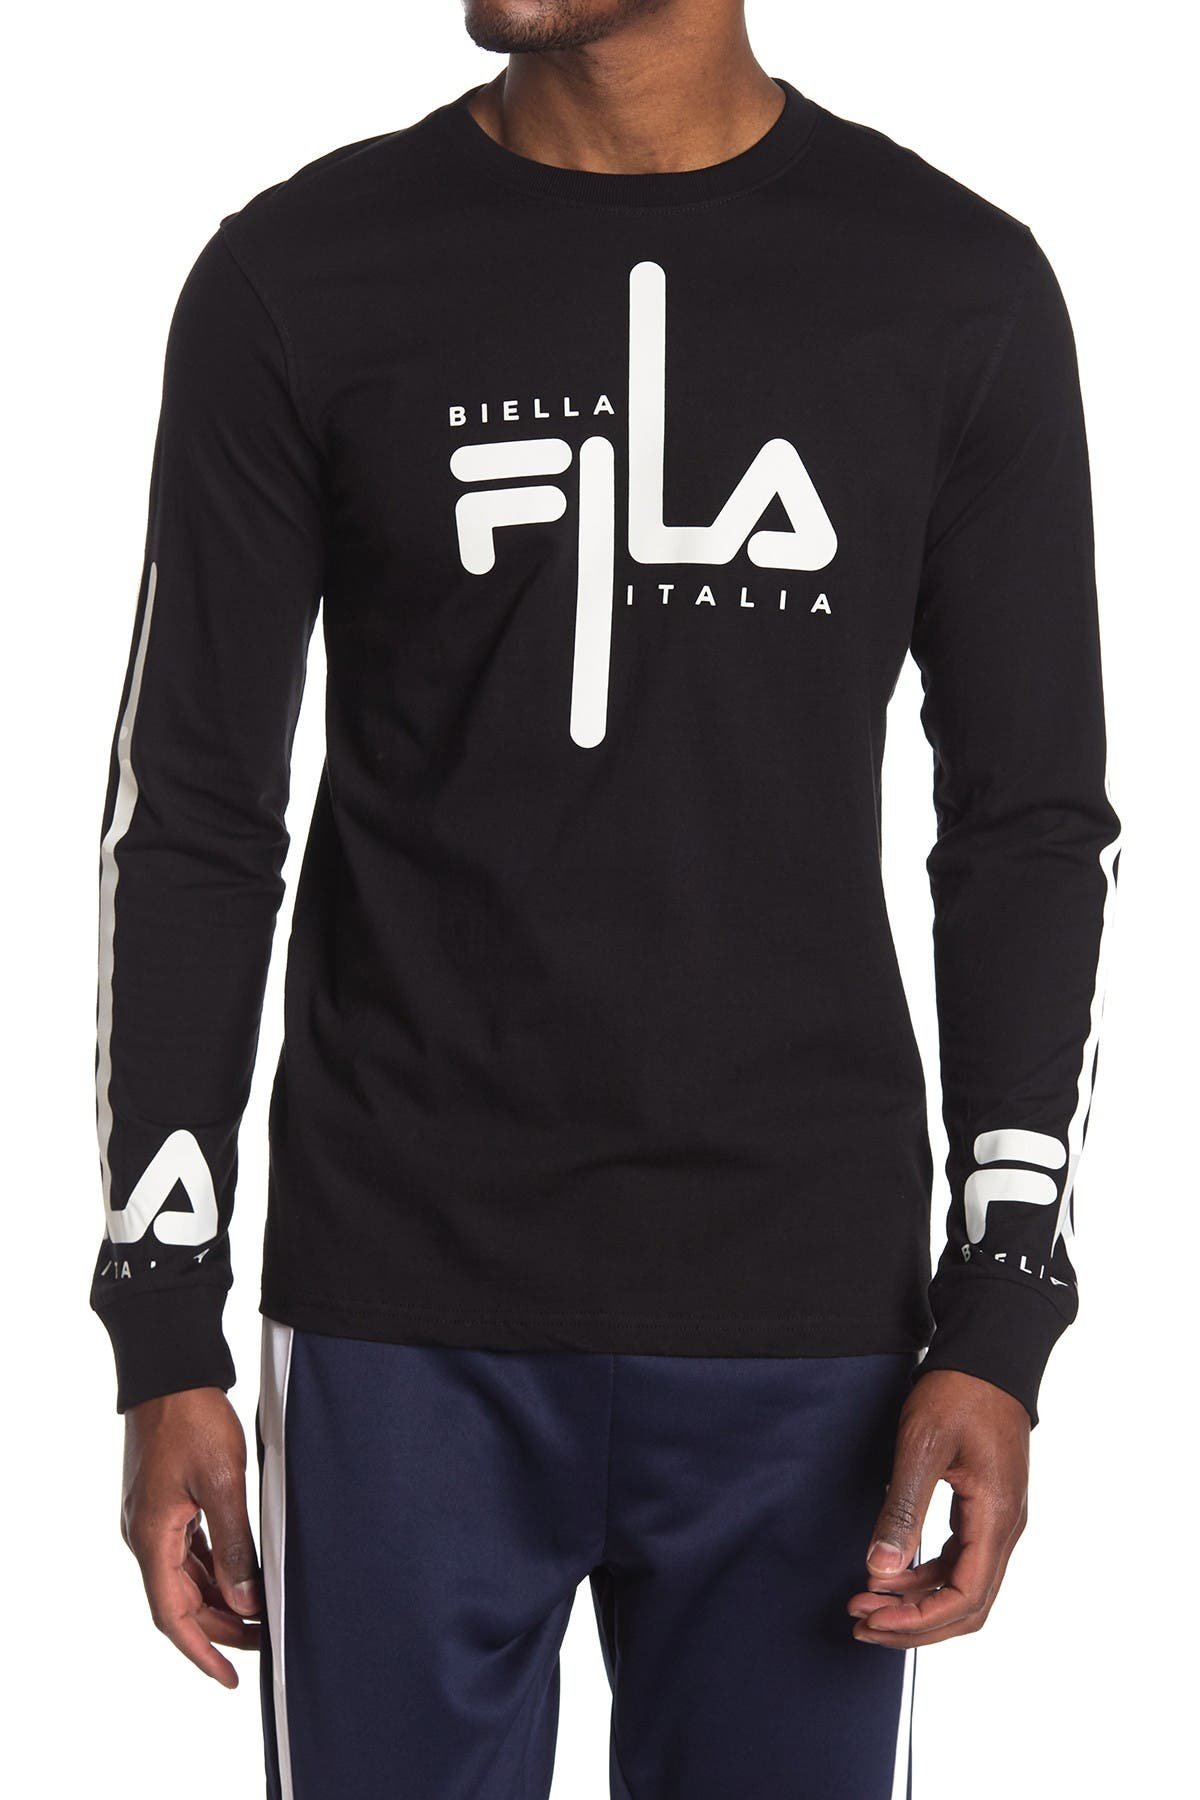 Image of FILA USA Martino Graphic Long Sleeve Shirt